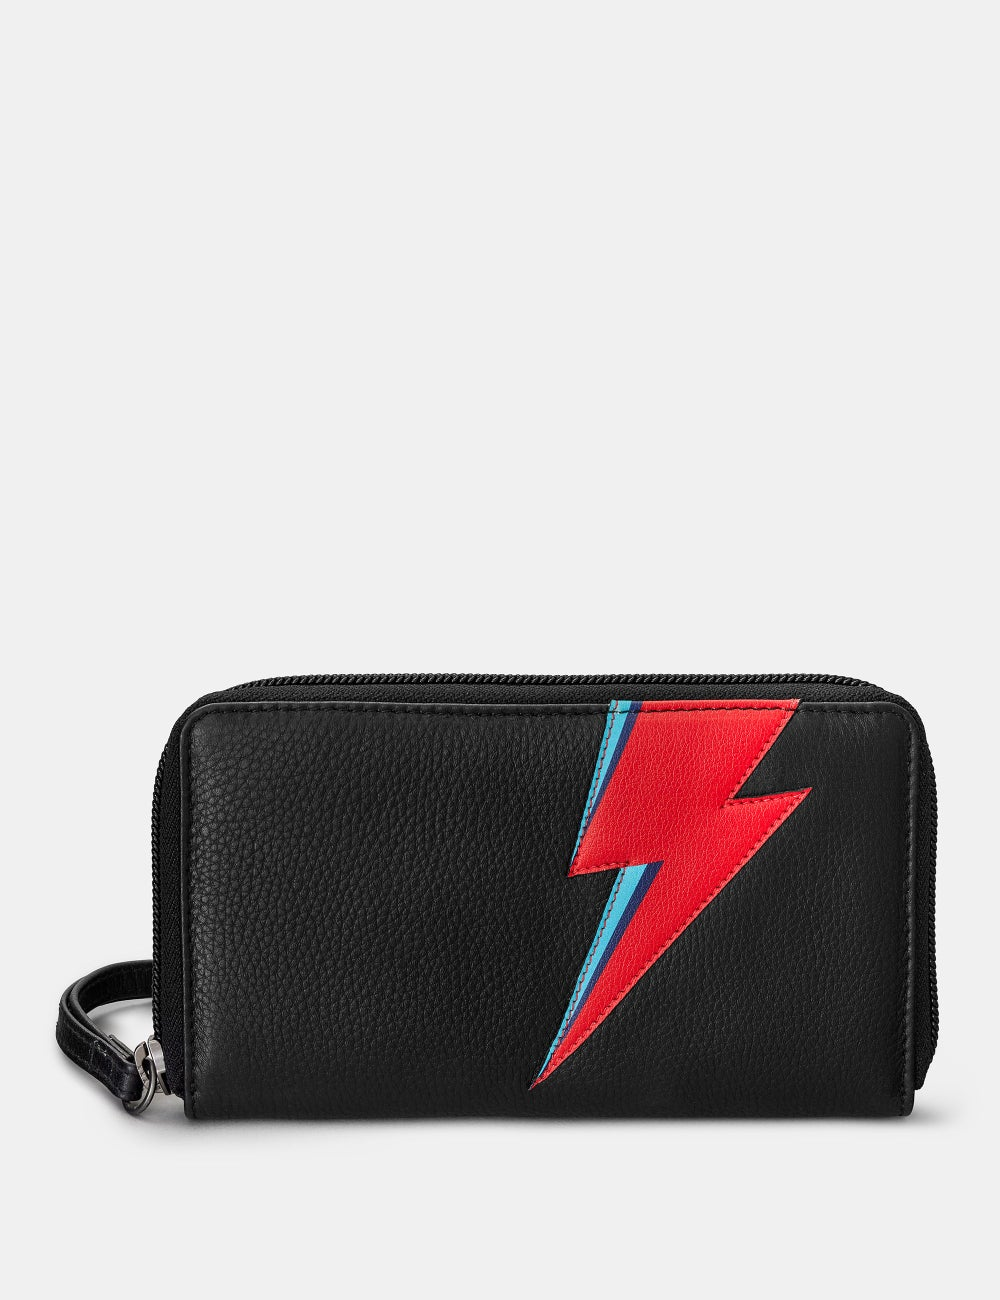 Lightning Bolt Black Zip Round Leather Purse With Wrist Strap